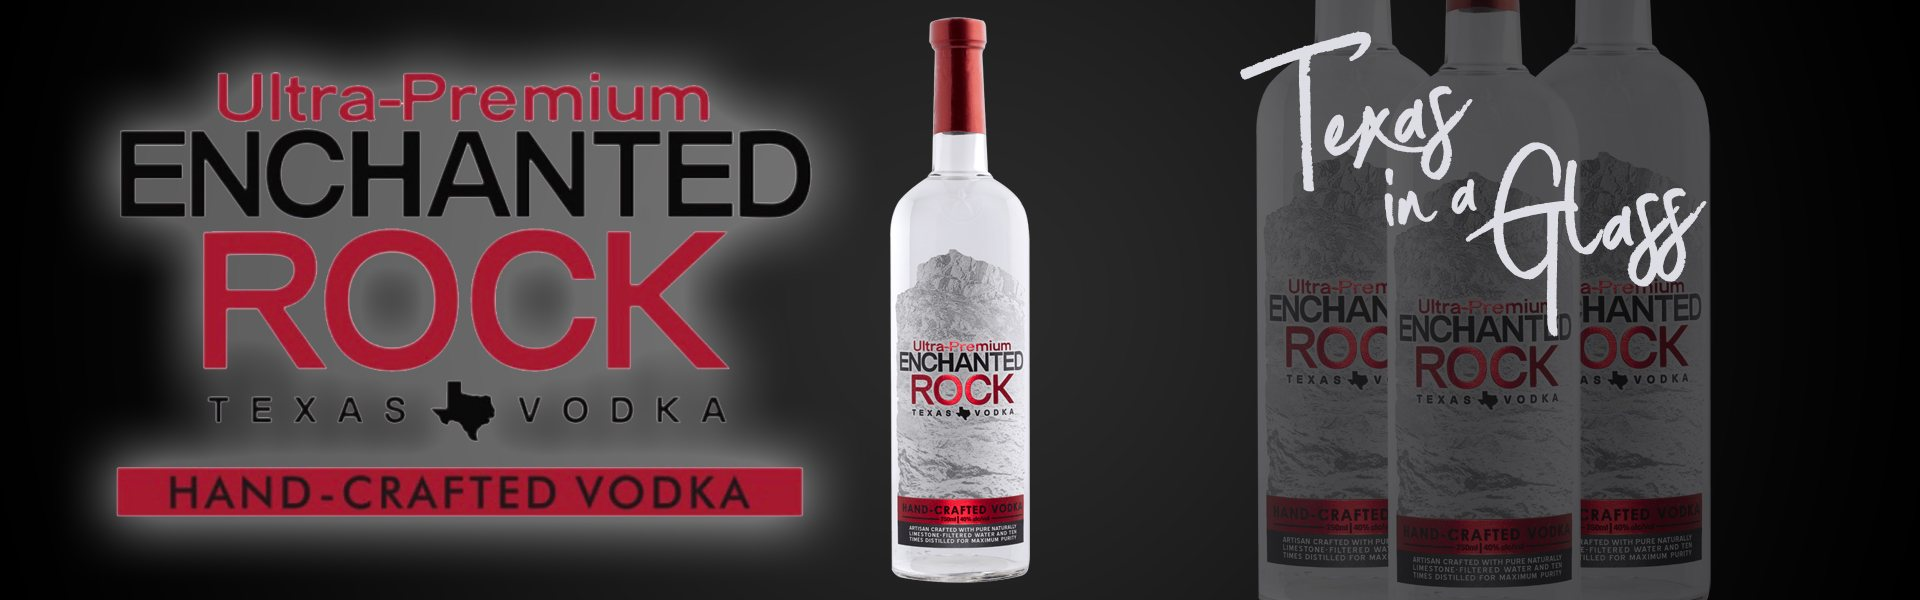 Enchanted Rock Vodka